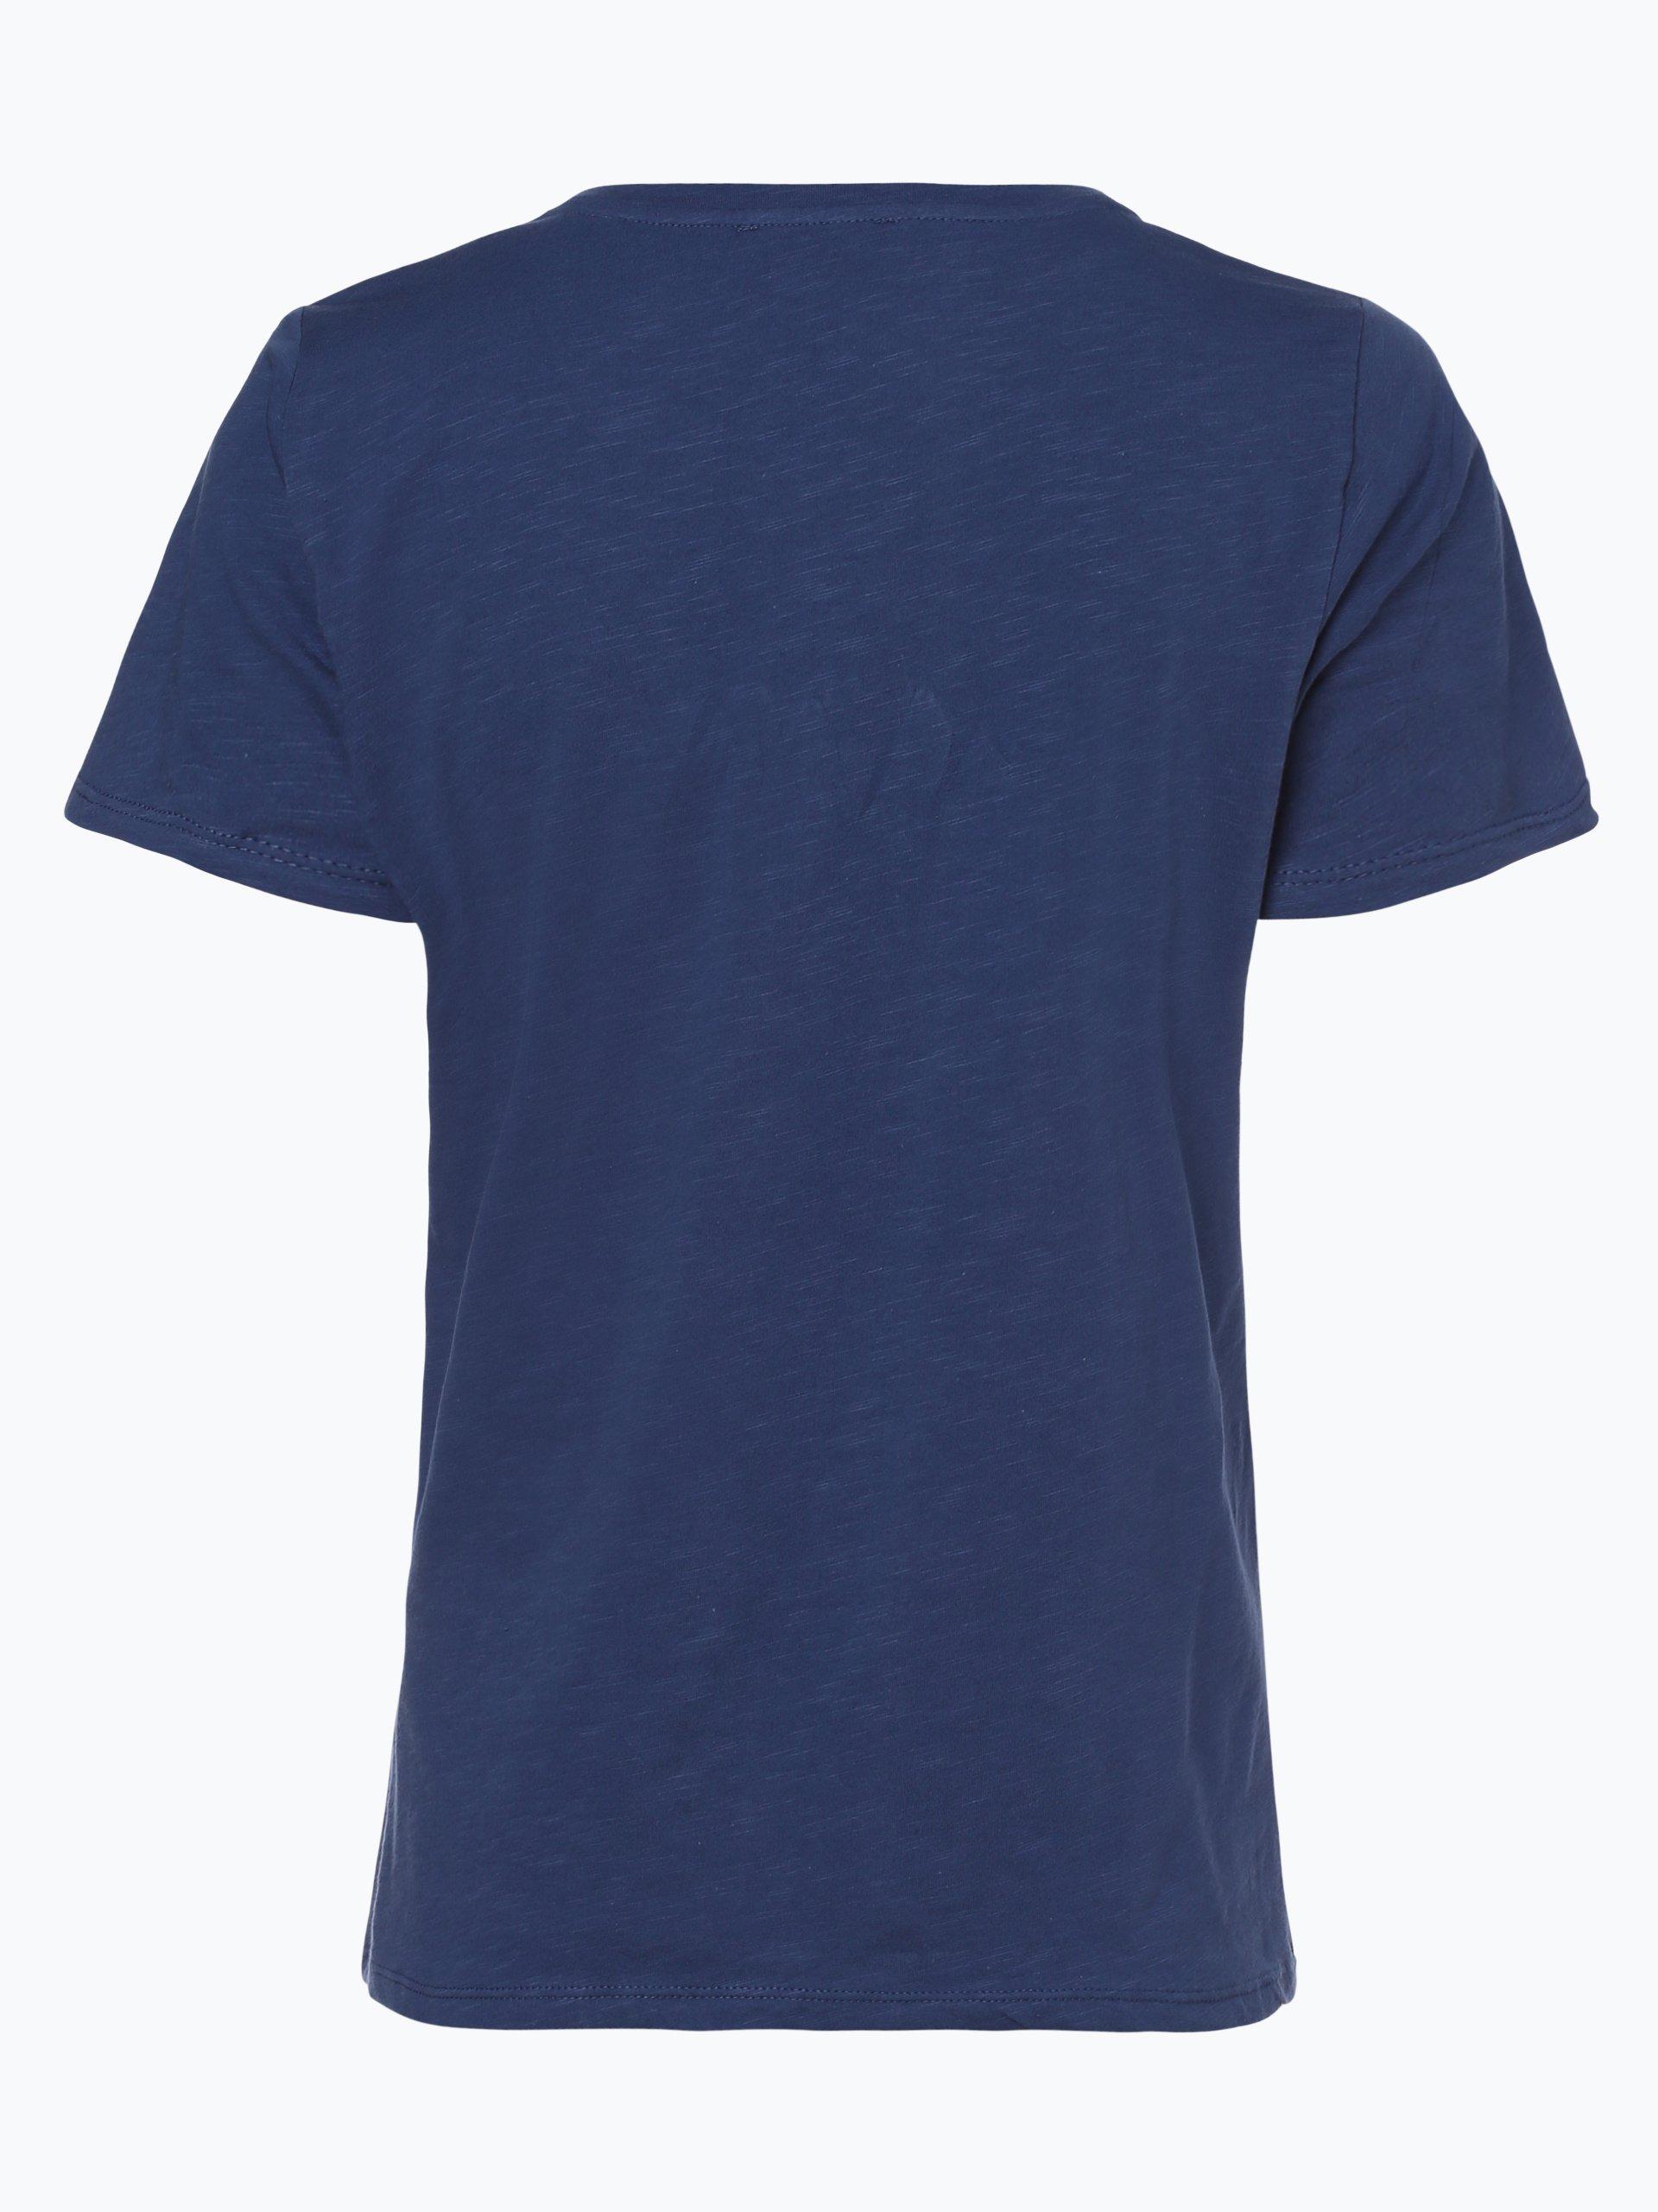 Franco Callegari Damen T-Shirt